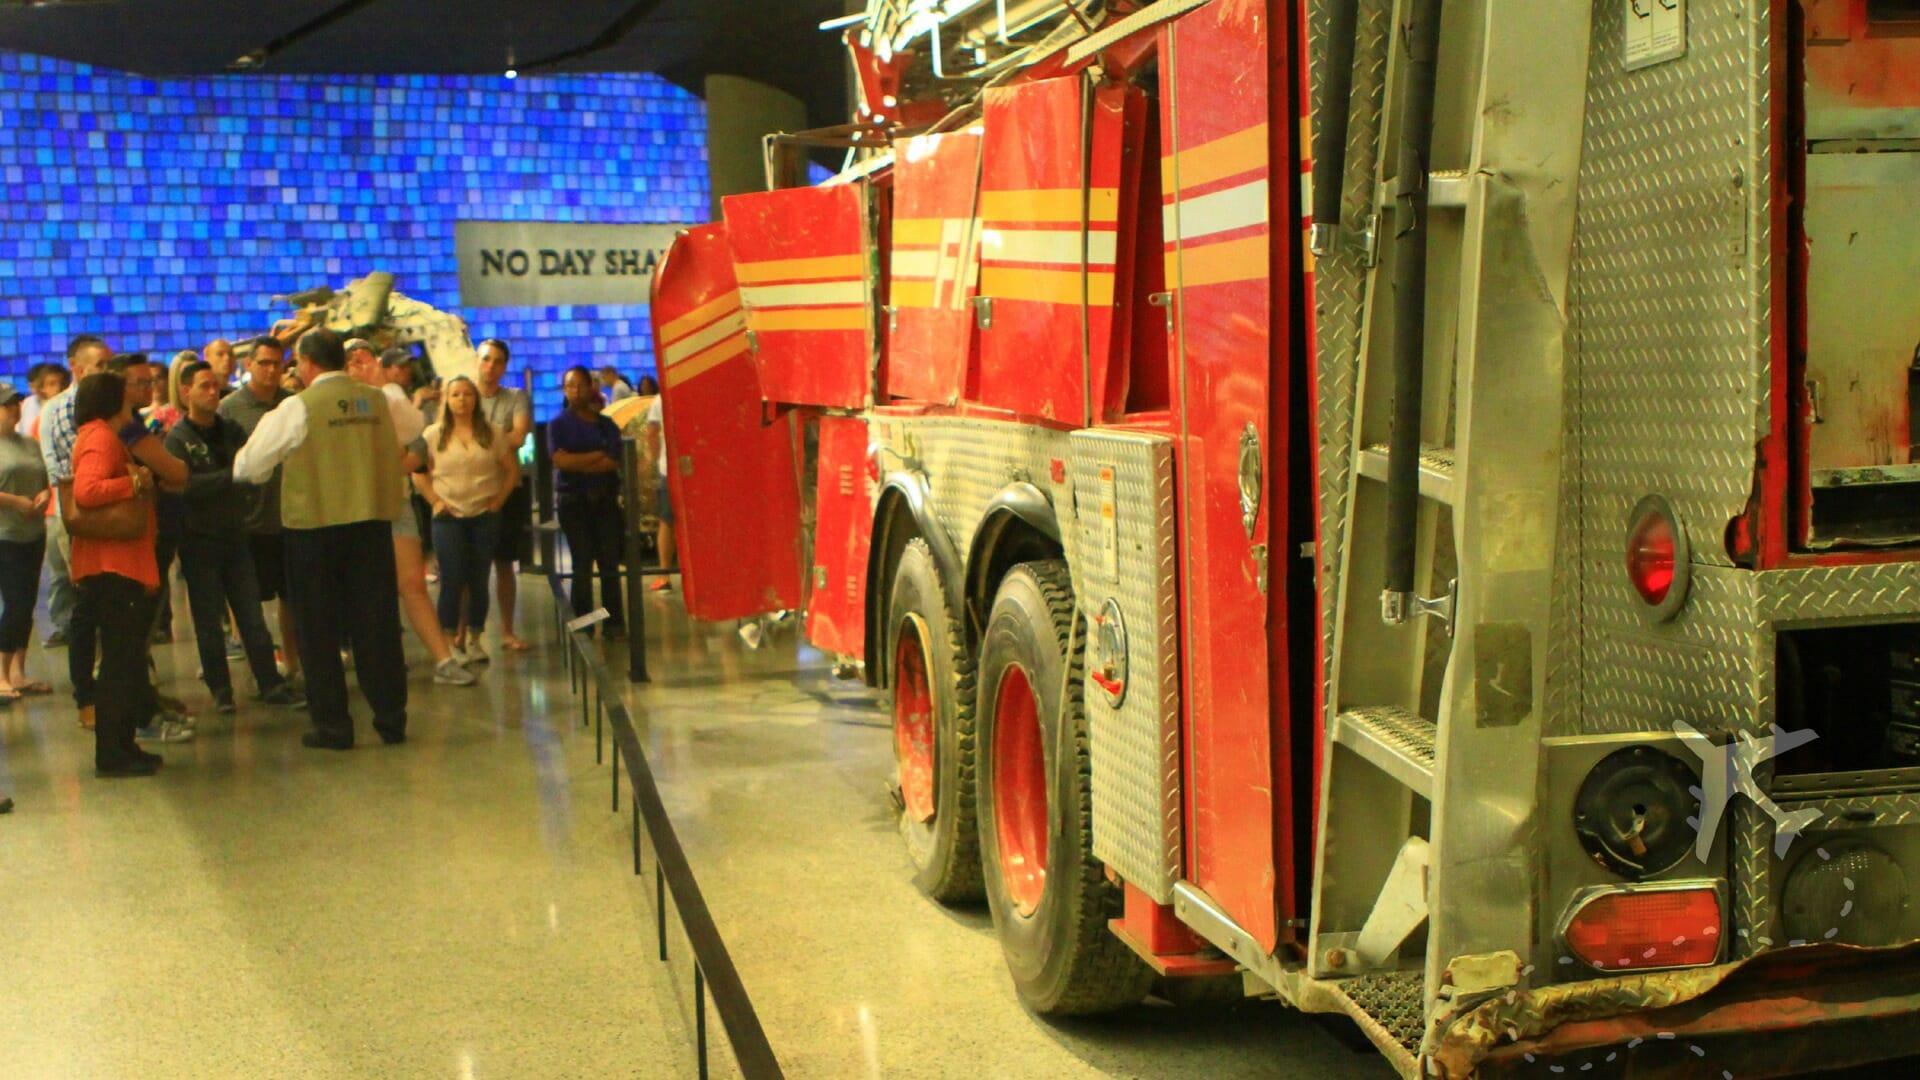 Ladder 3 - World Trade Center